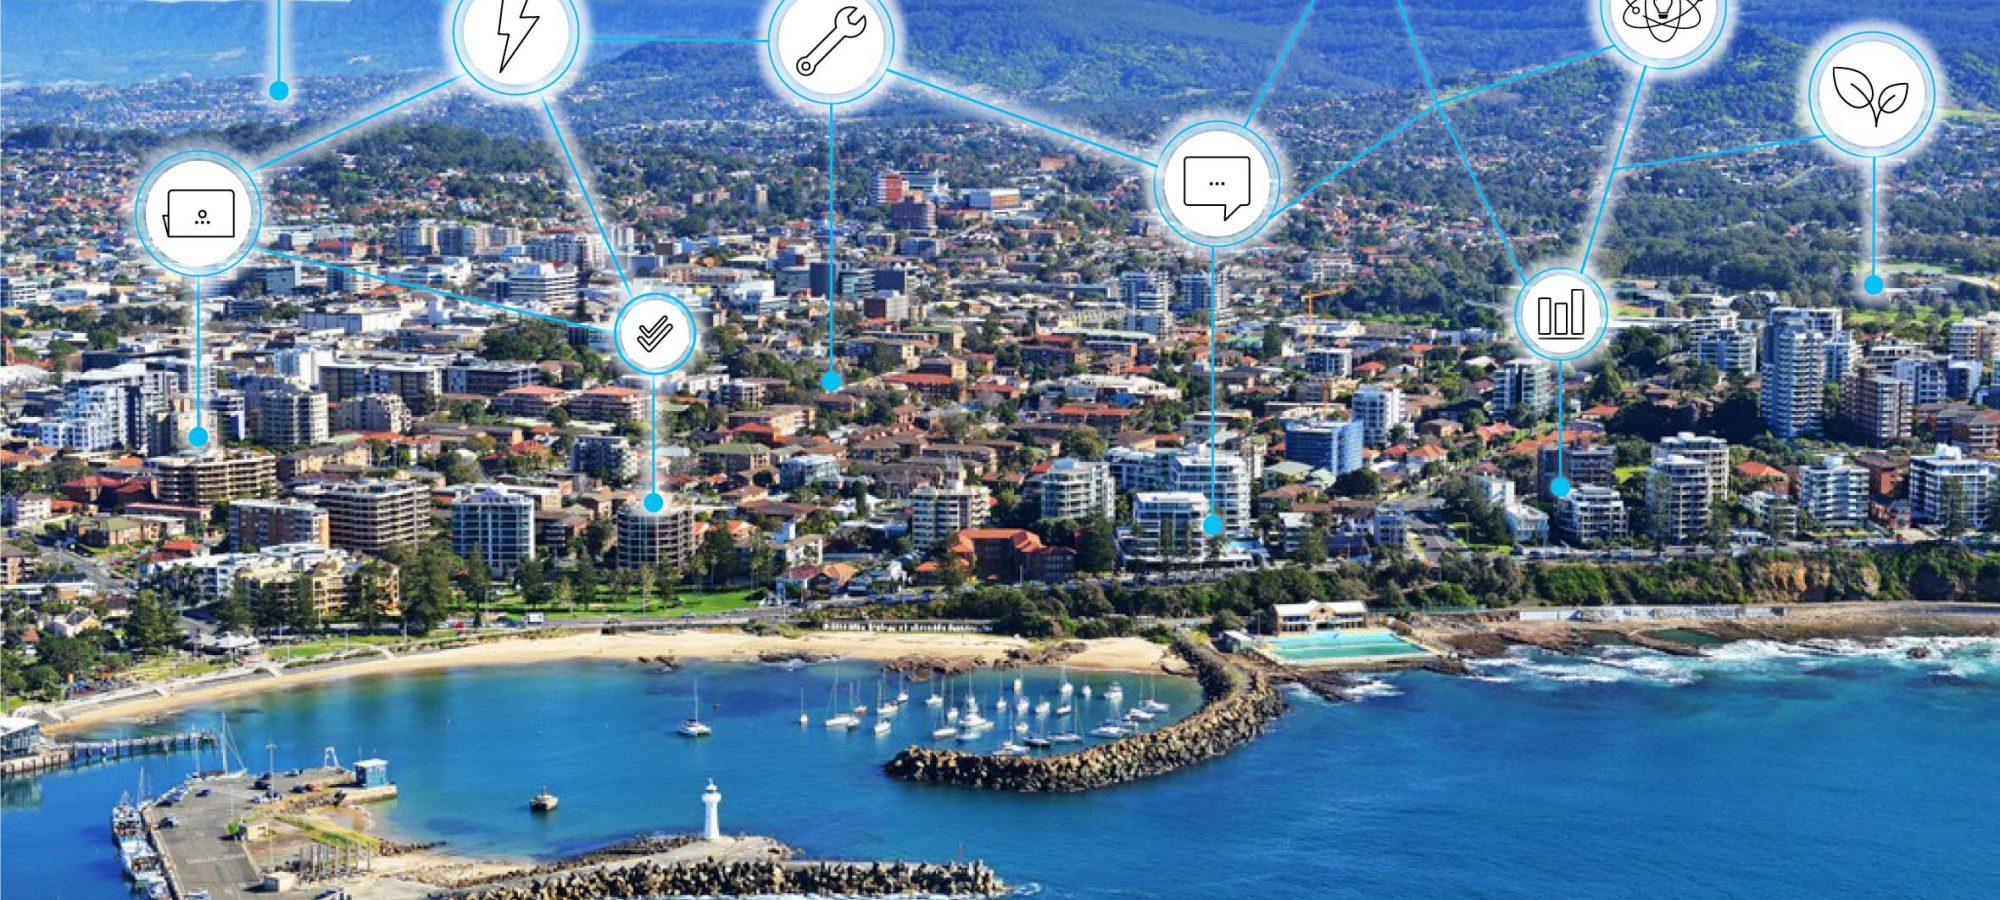 Reimagining Wollongong's Future